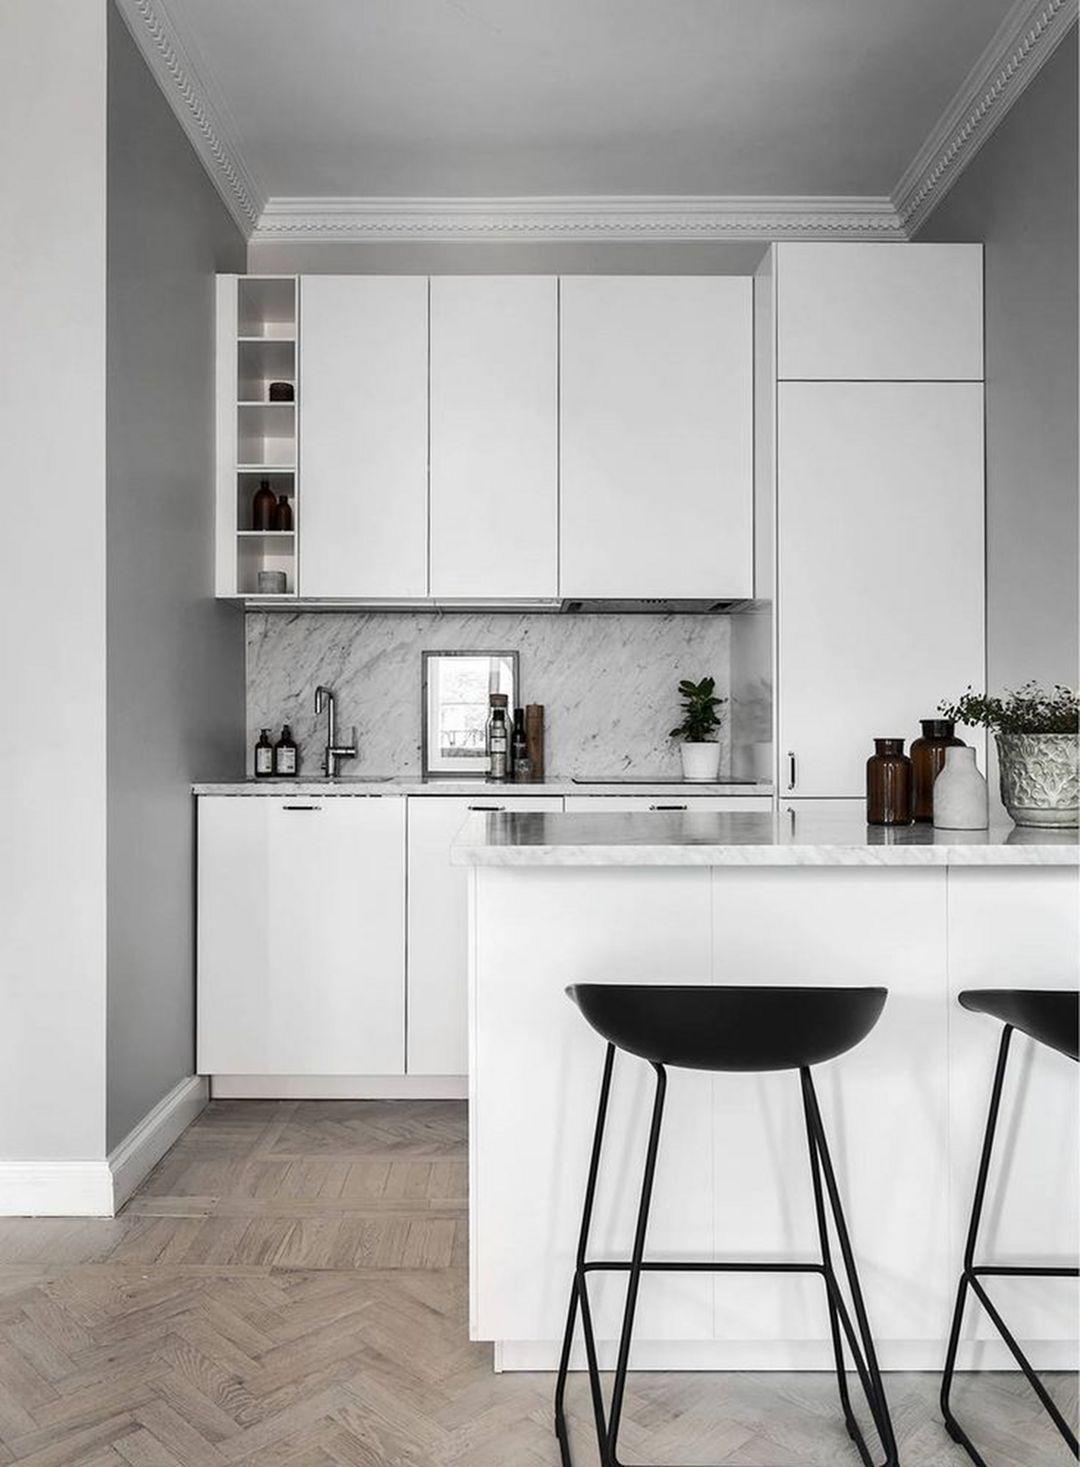 20 Amazing Small Modern Kitchen Design For Best Inspiration When